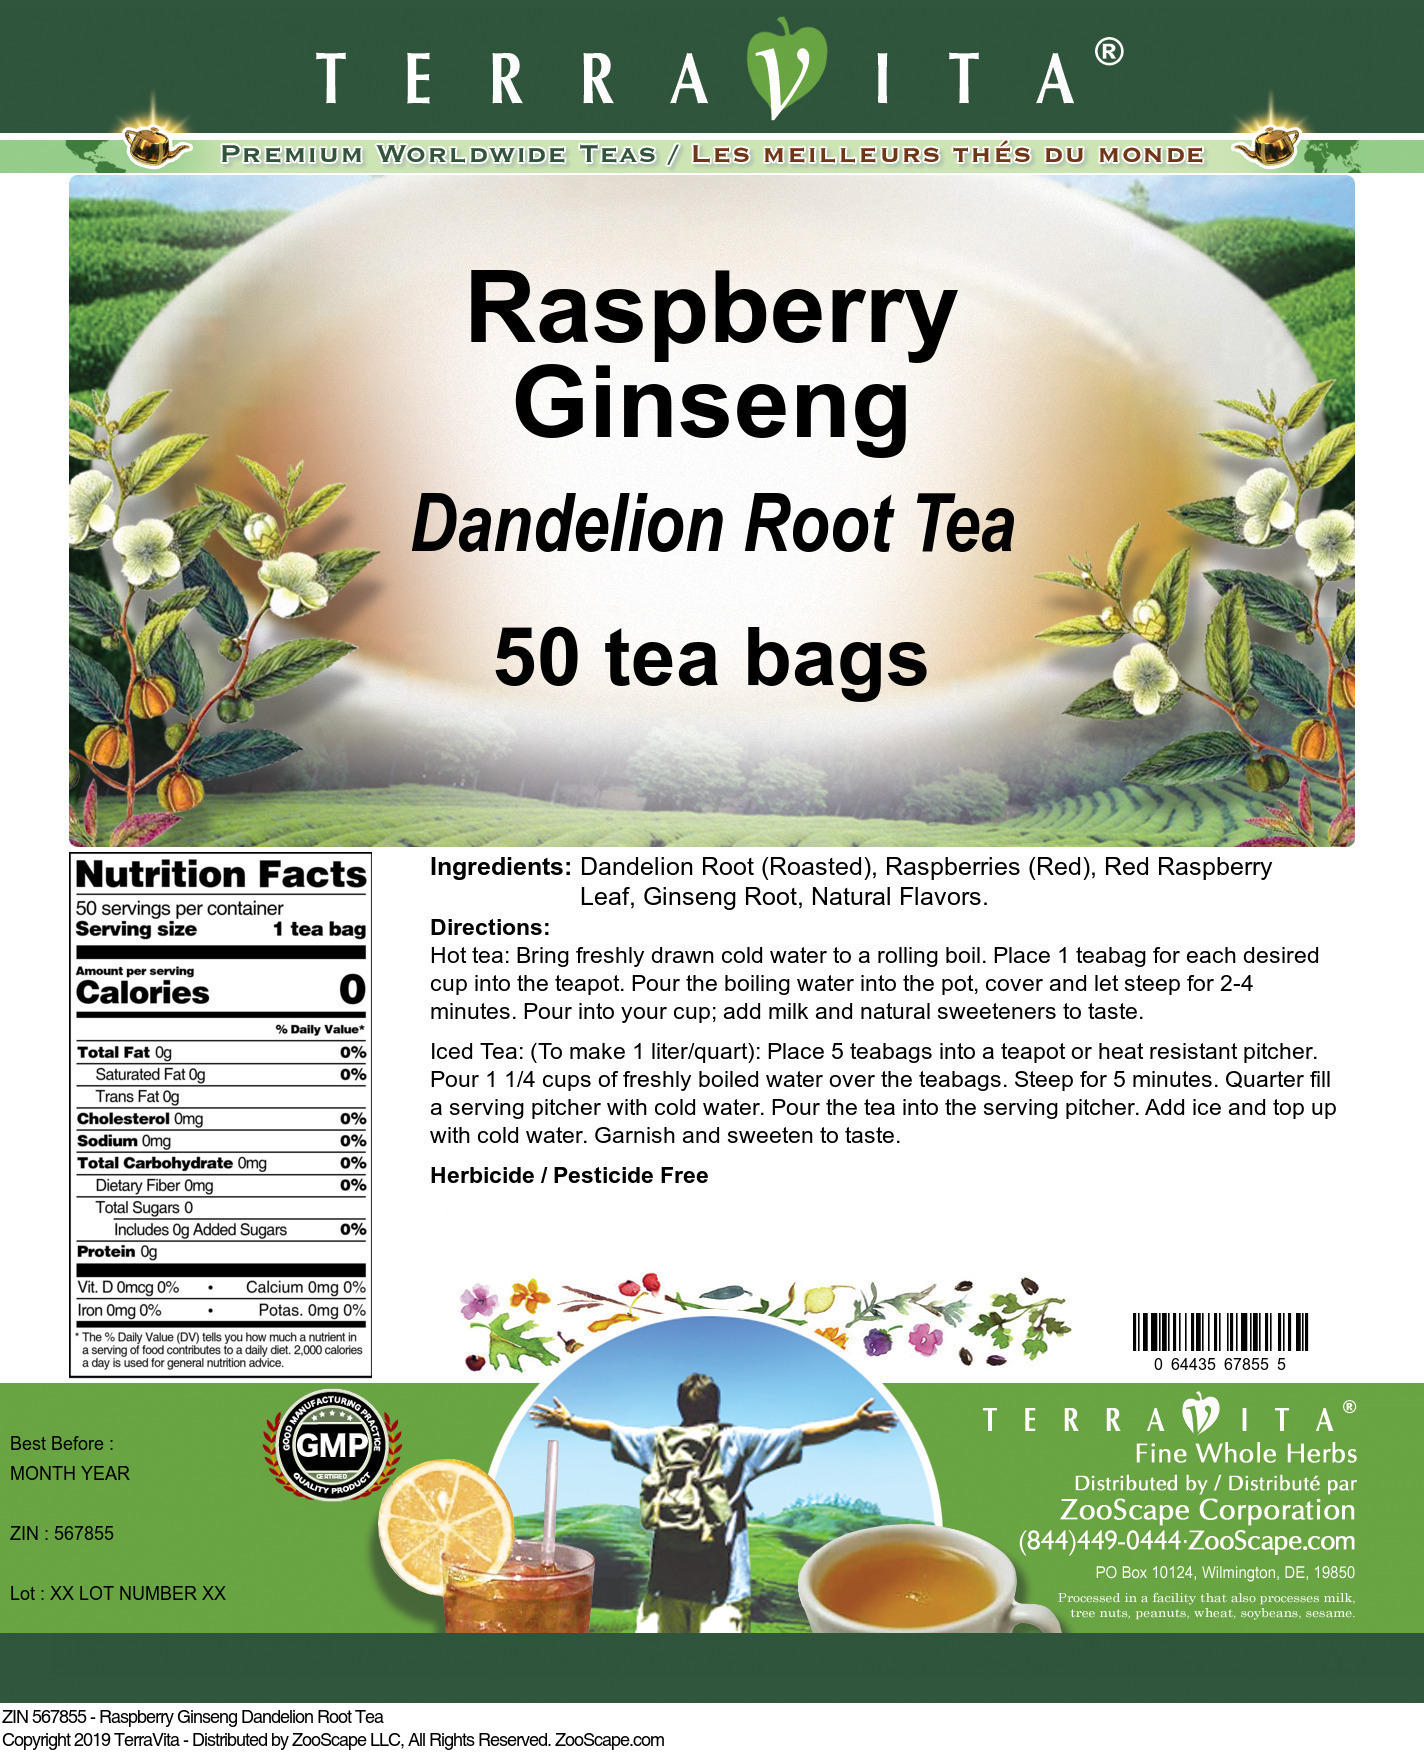 Raspberry Ginseng Dandelion Root